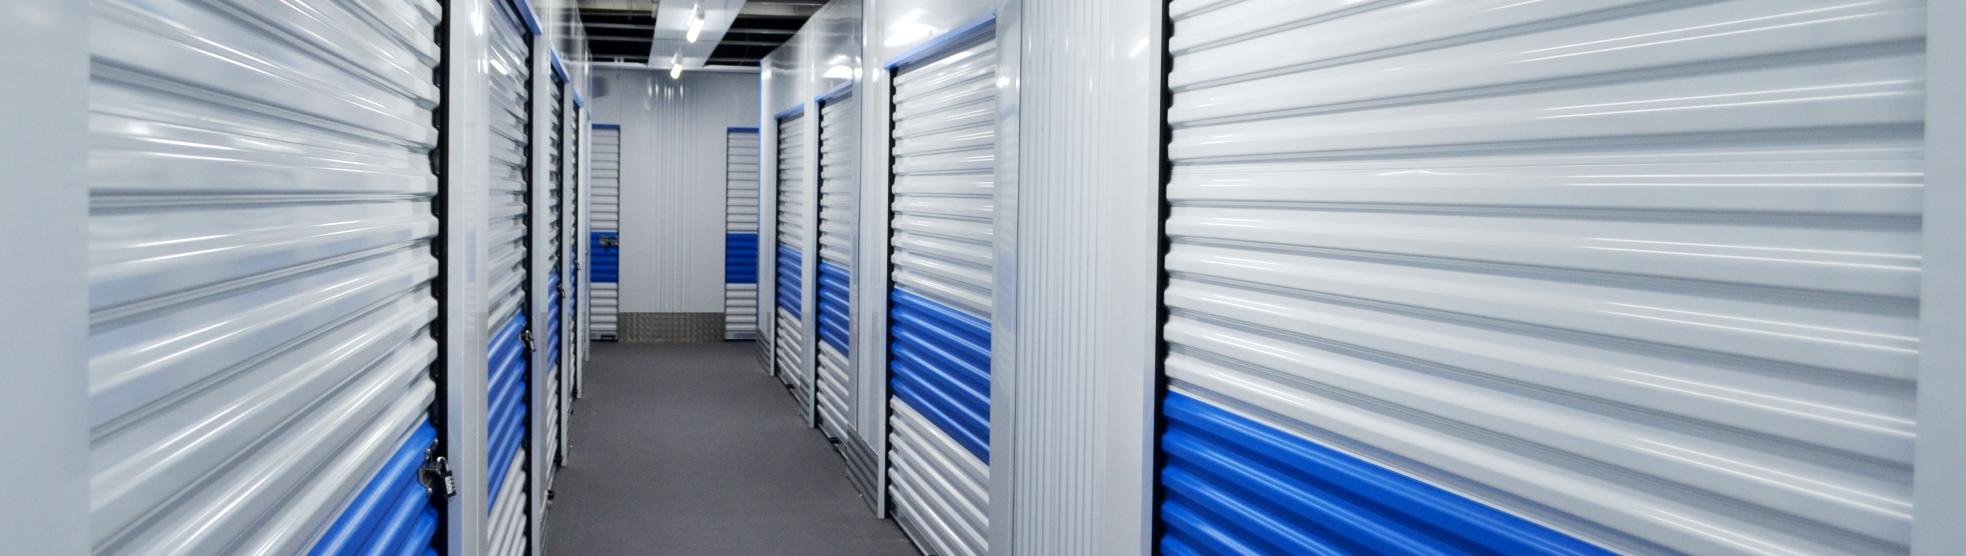 Rolltore Lagerboxen in Velbert blauer Bereich